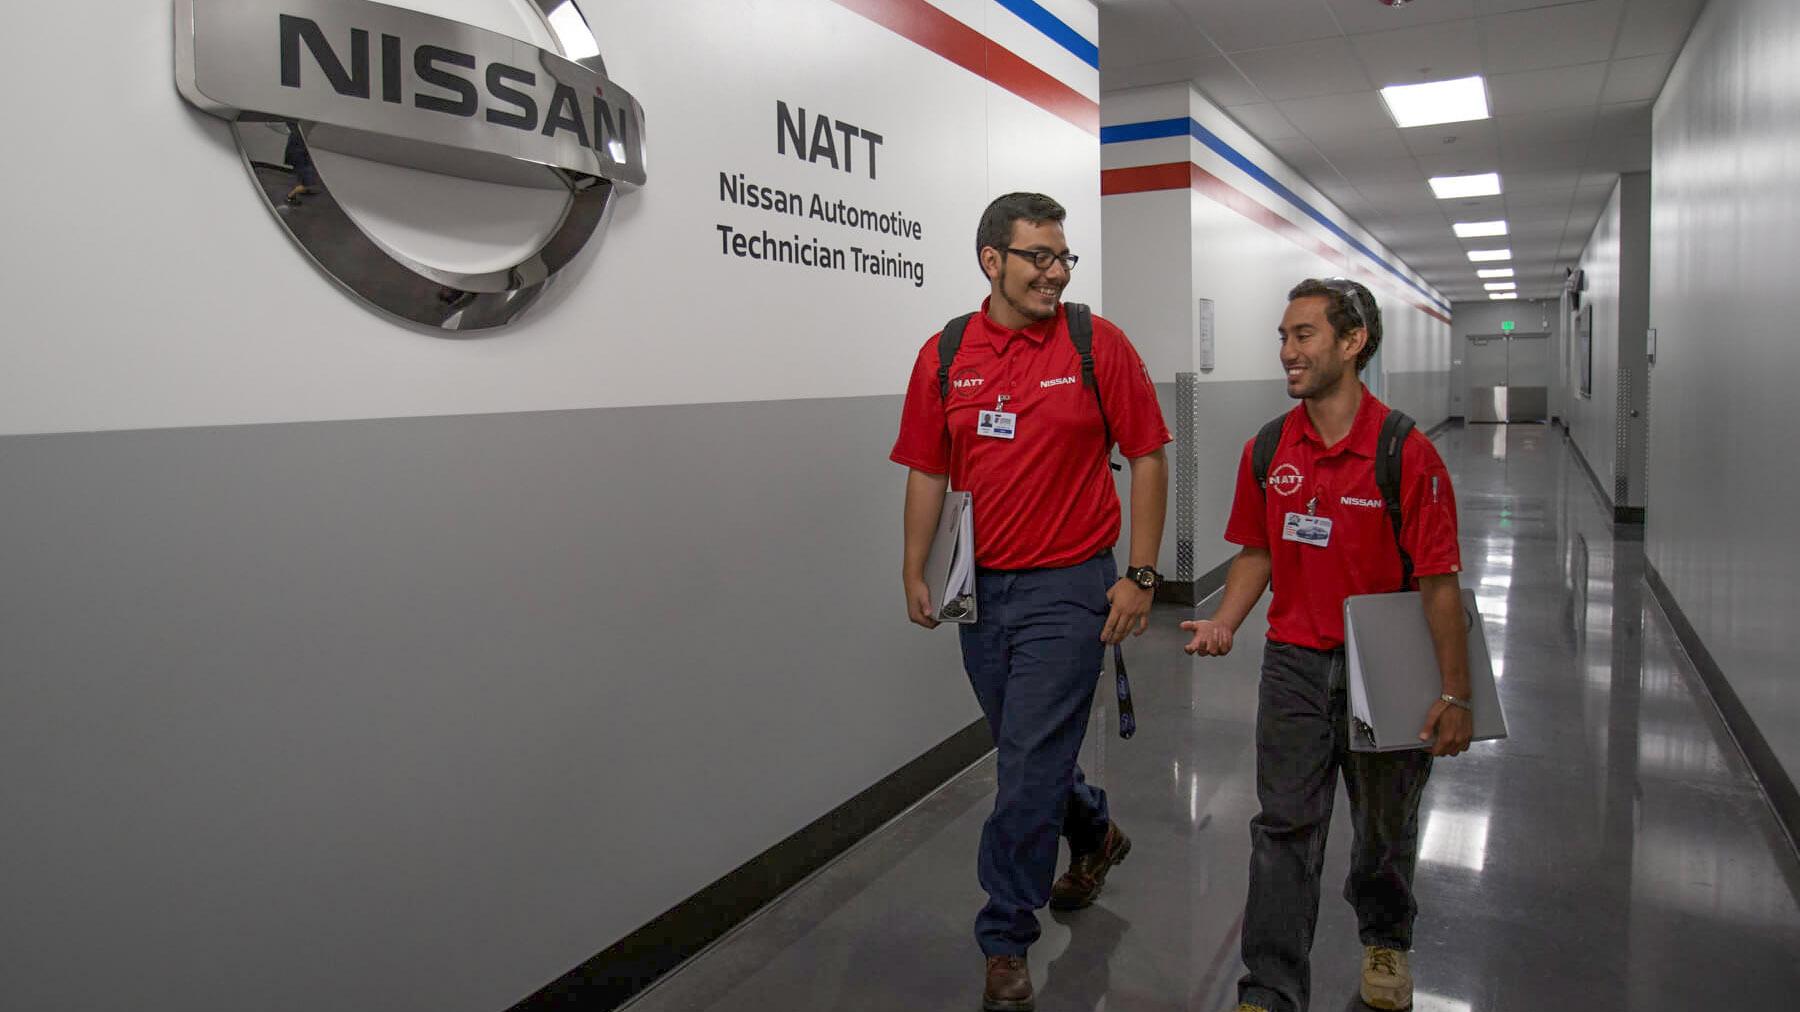 Specialized Training_4x3_Nissan_Student Walking in Hallway